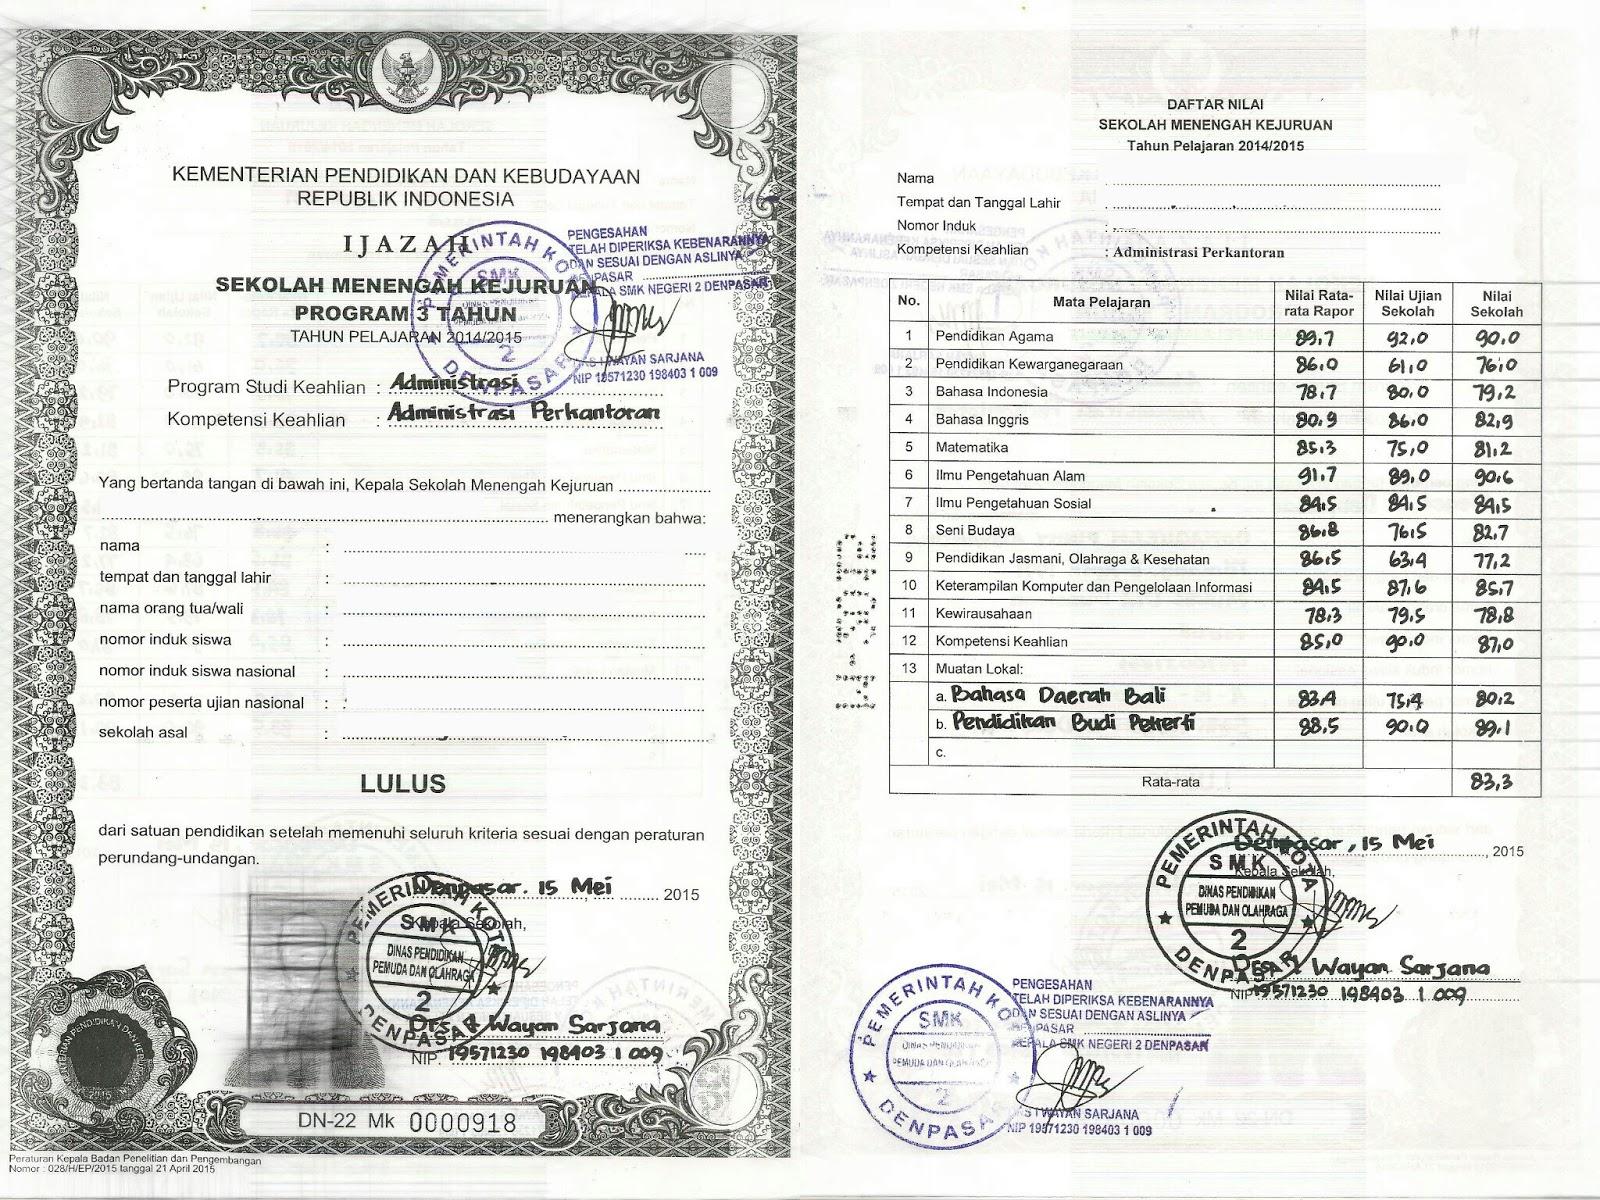 Aisyandha S Pengalaman Mengikuti Rekrutmen Pt Pln Posisi Non Teknik Administrasi